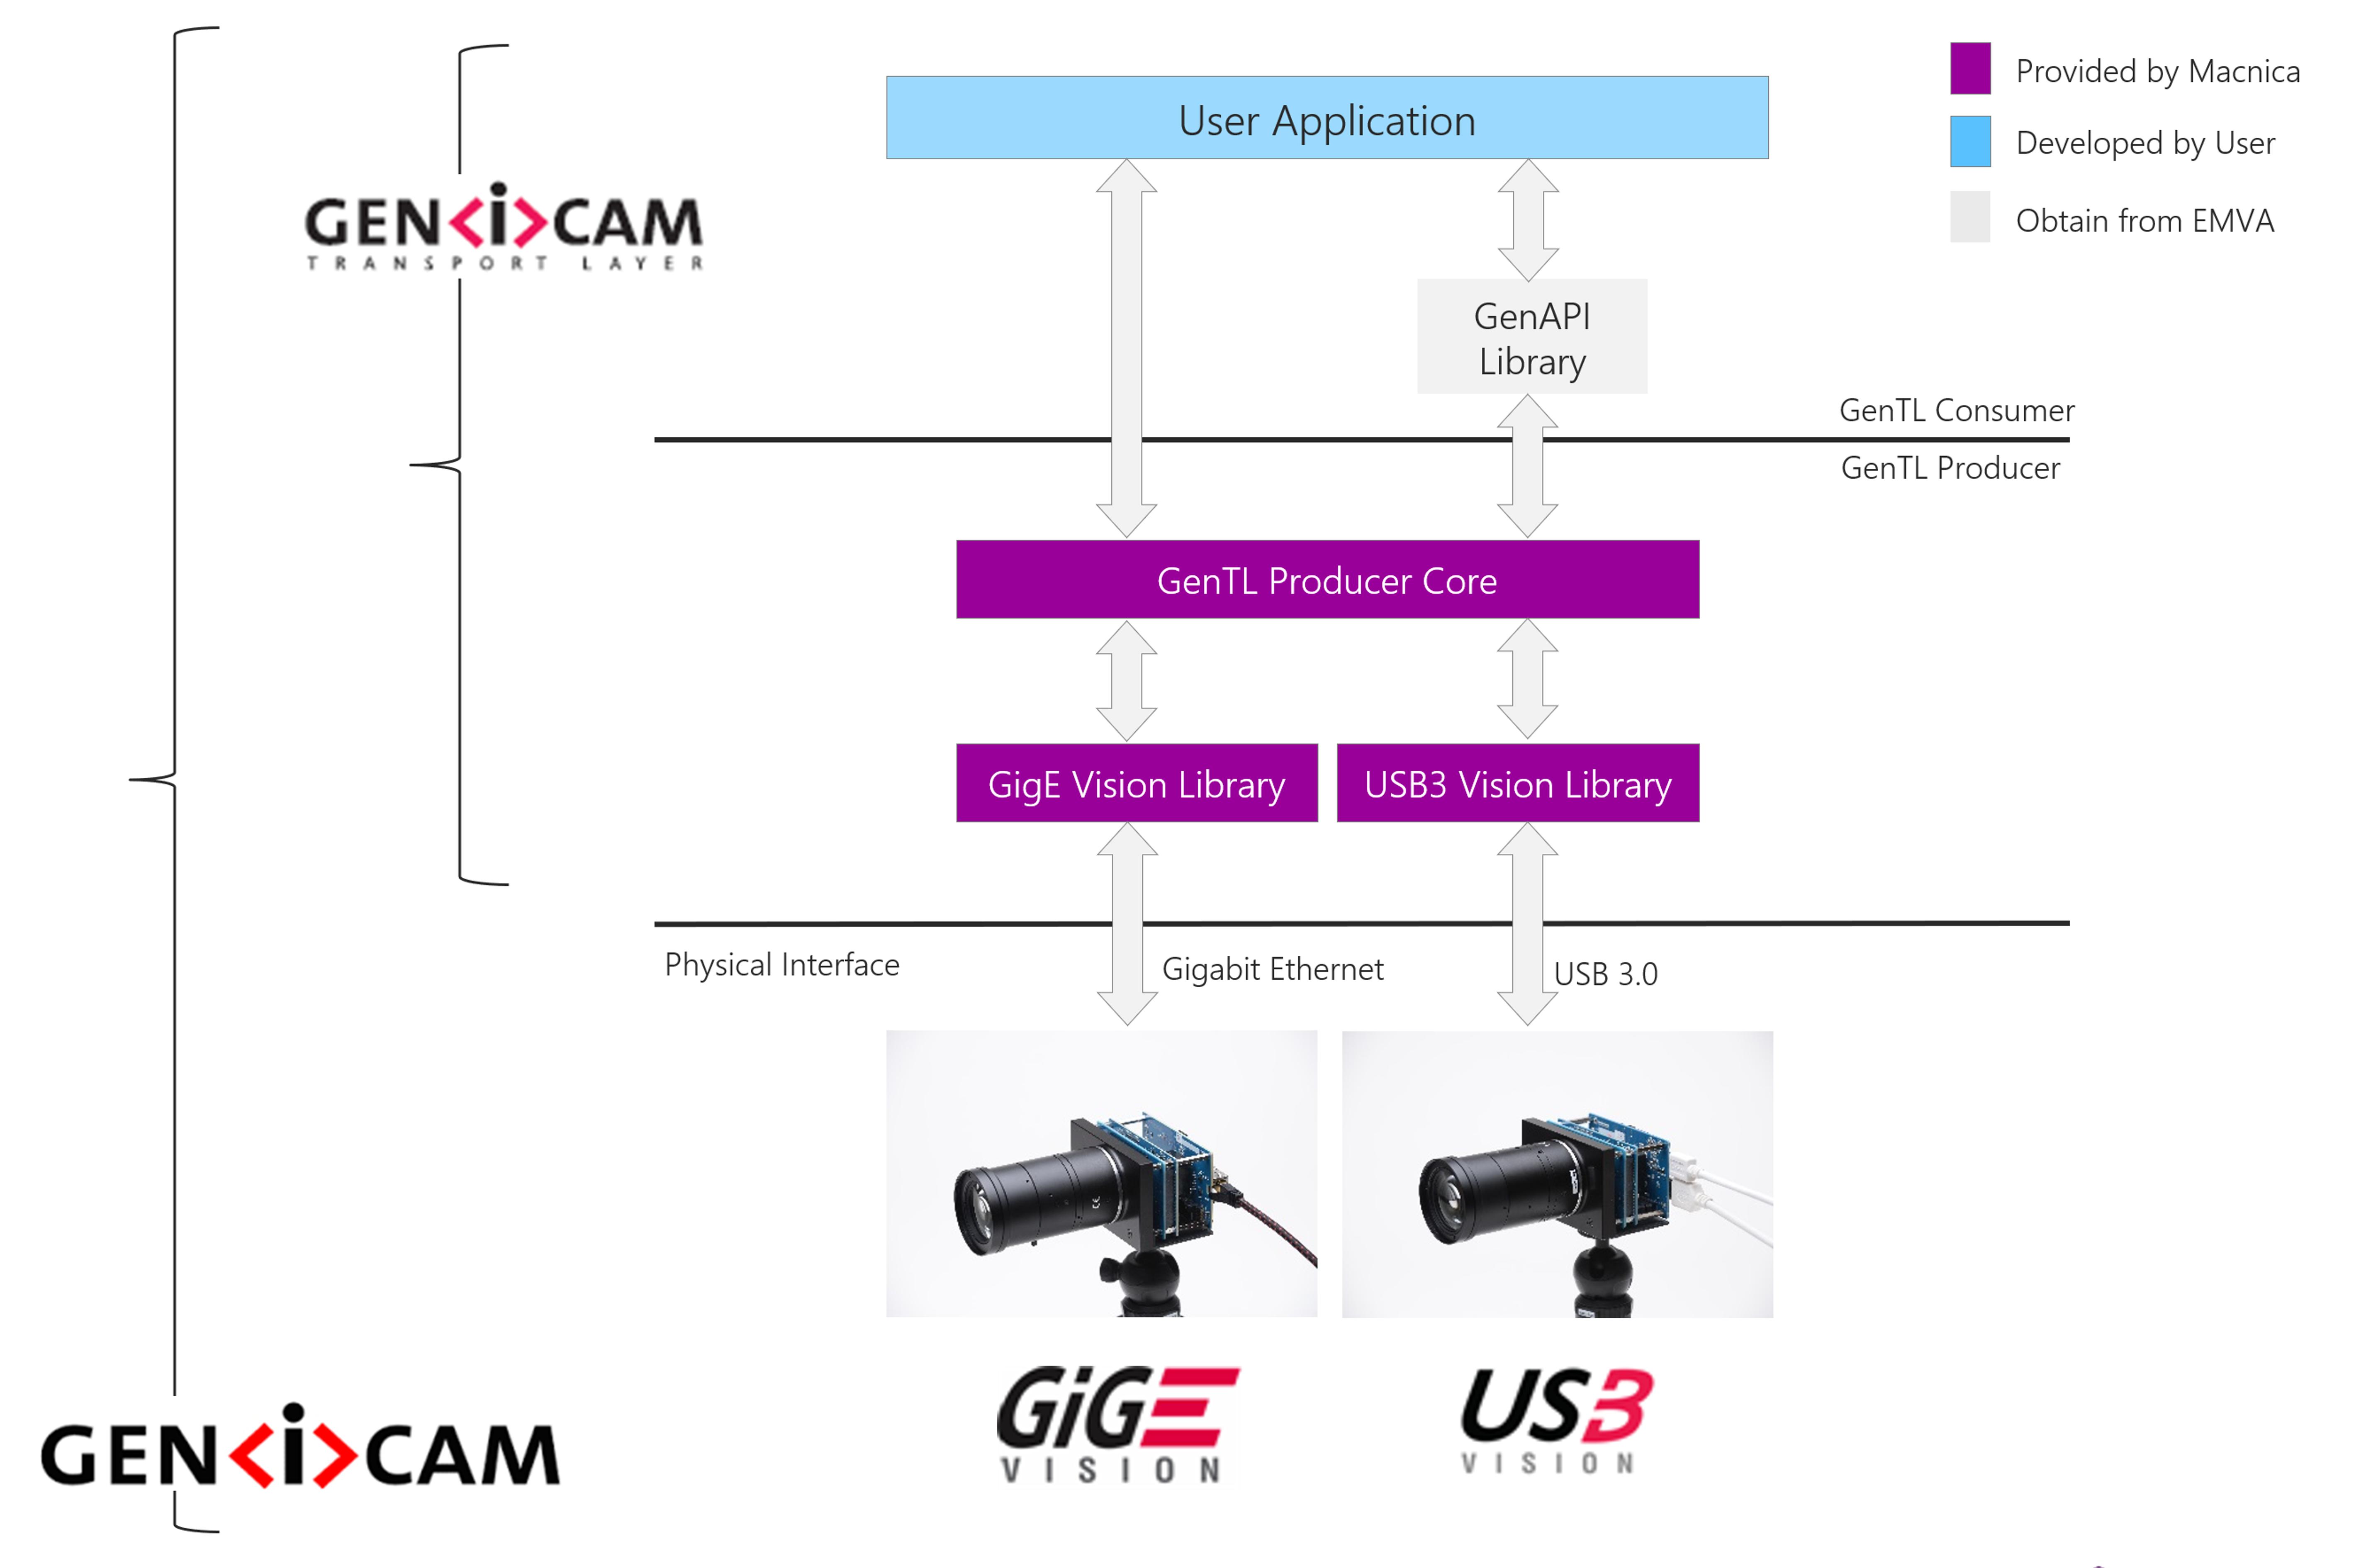 GenICam Software Configuration